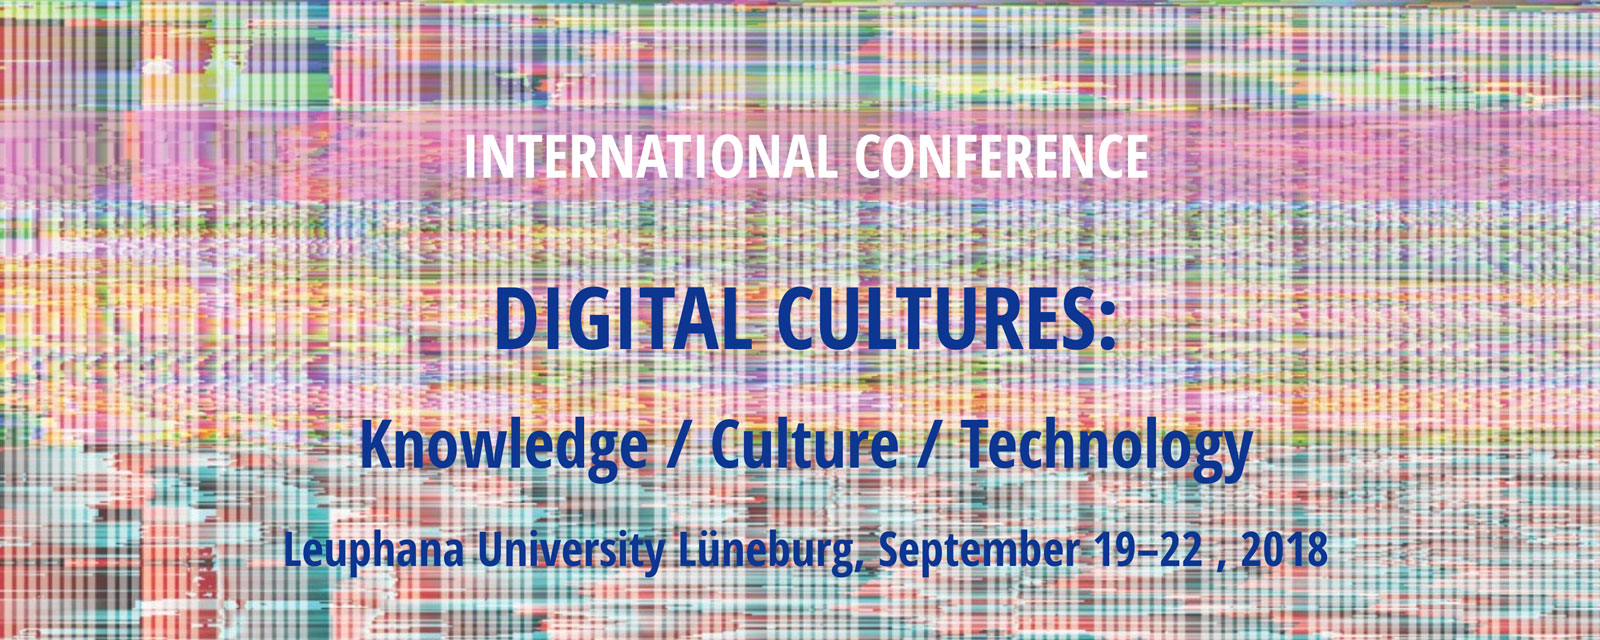 Presentation at Digital Cultures 2018 Conference at Leuphana